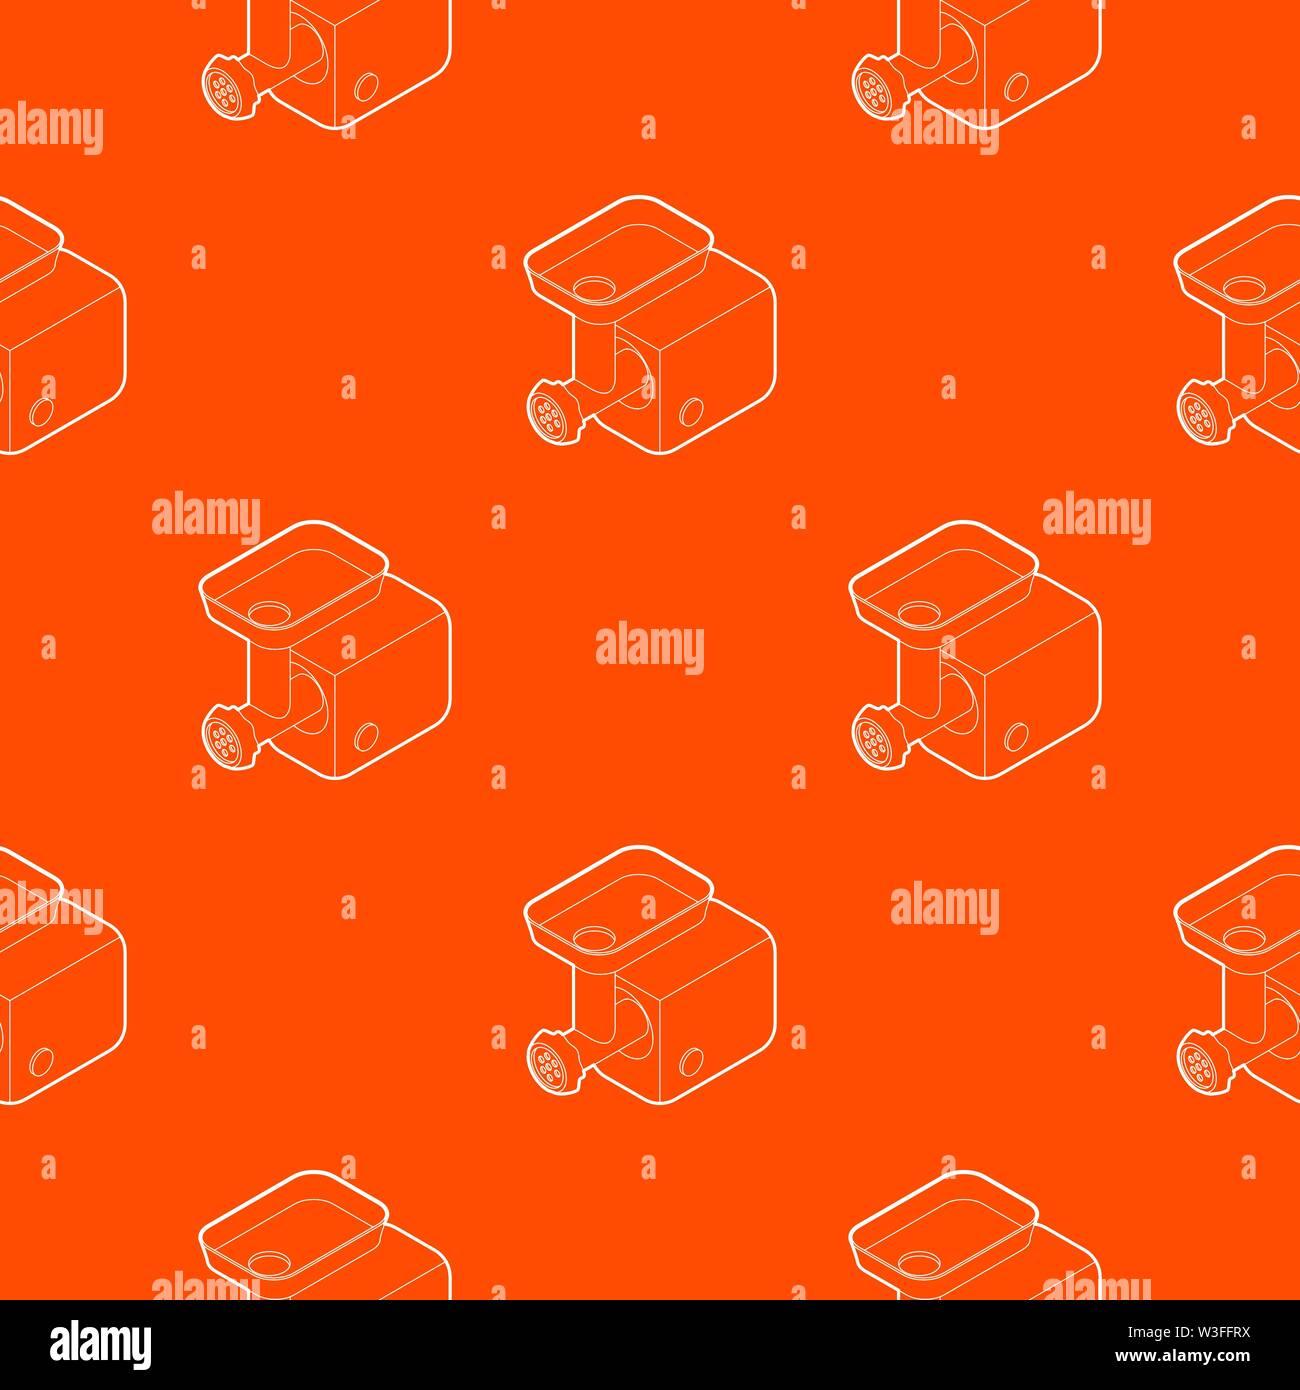 Electric meat grinder pattern vector orange - Stock Image